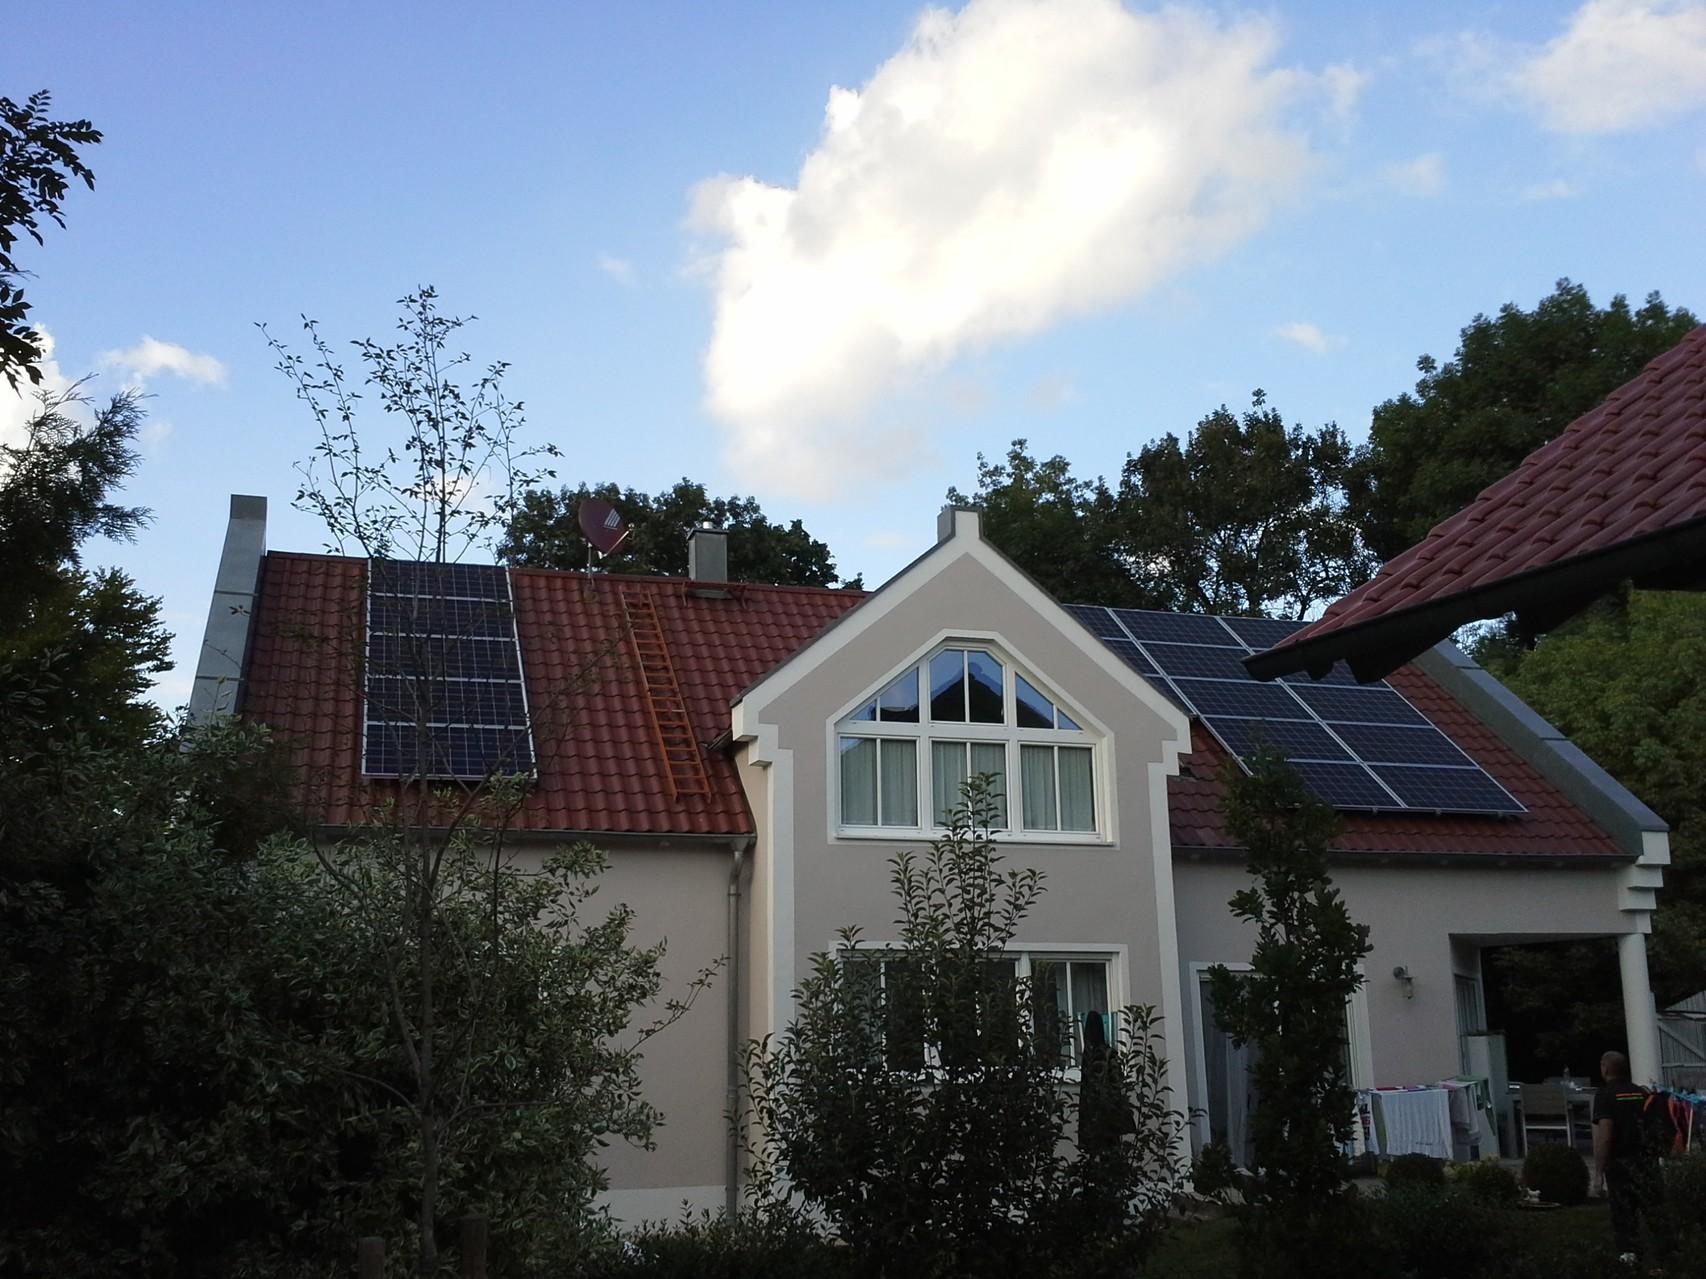 Phototovoltaikanlage 9,75 kWp in 85104 Pförring mit SHARP Module